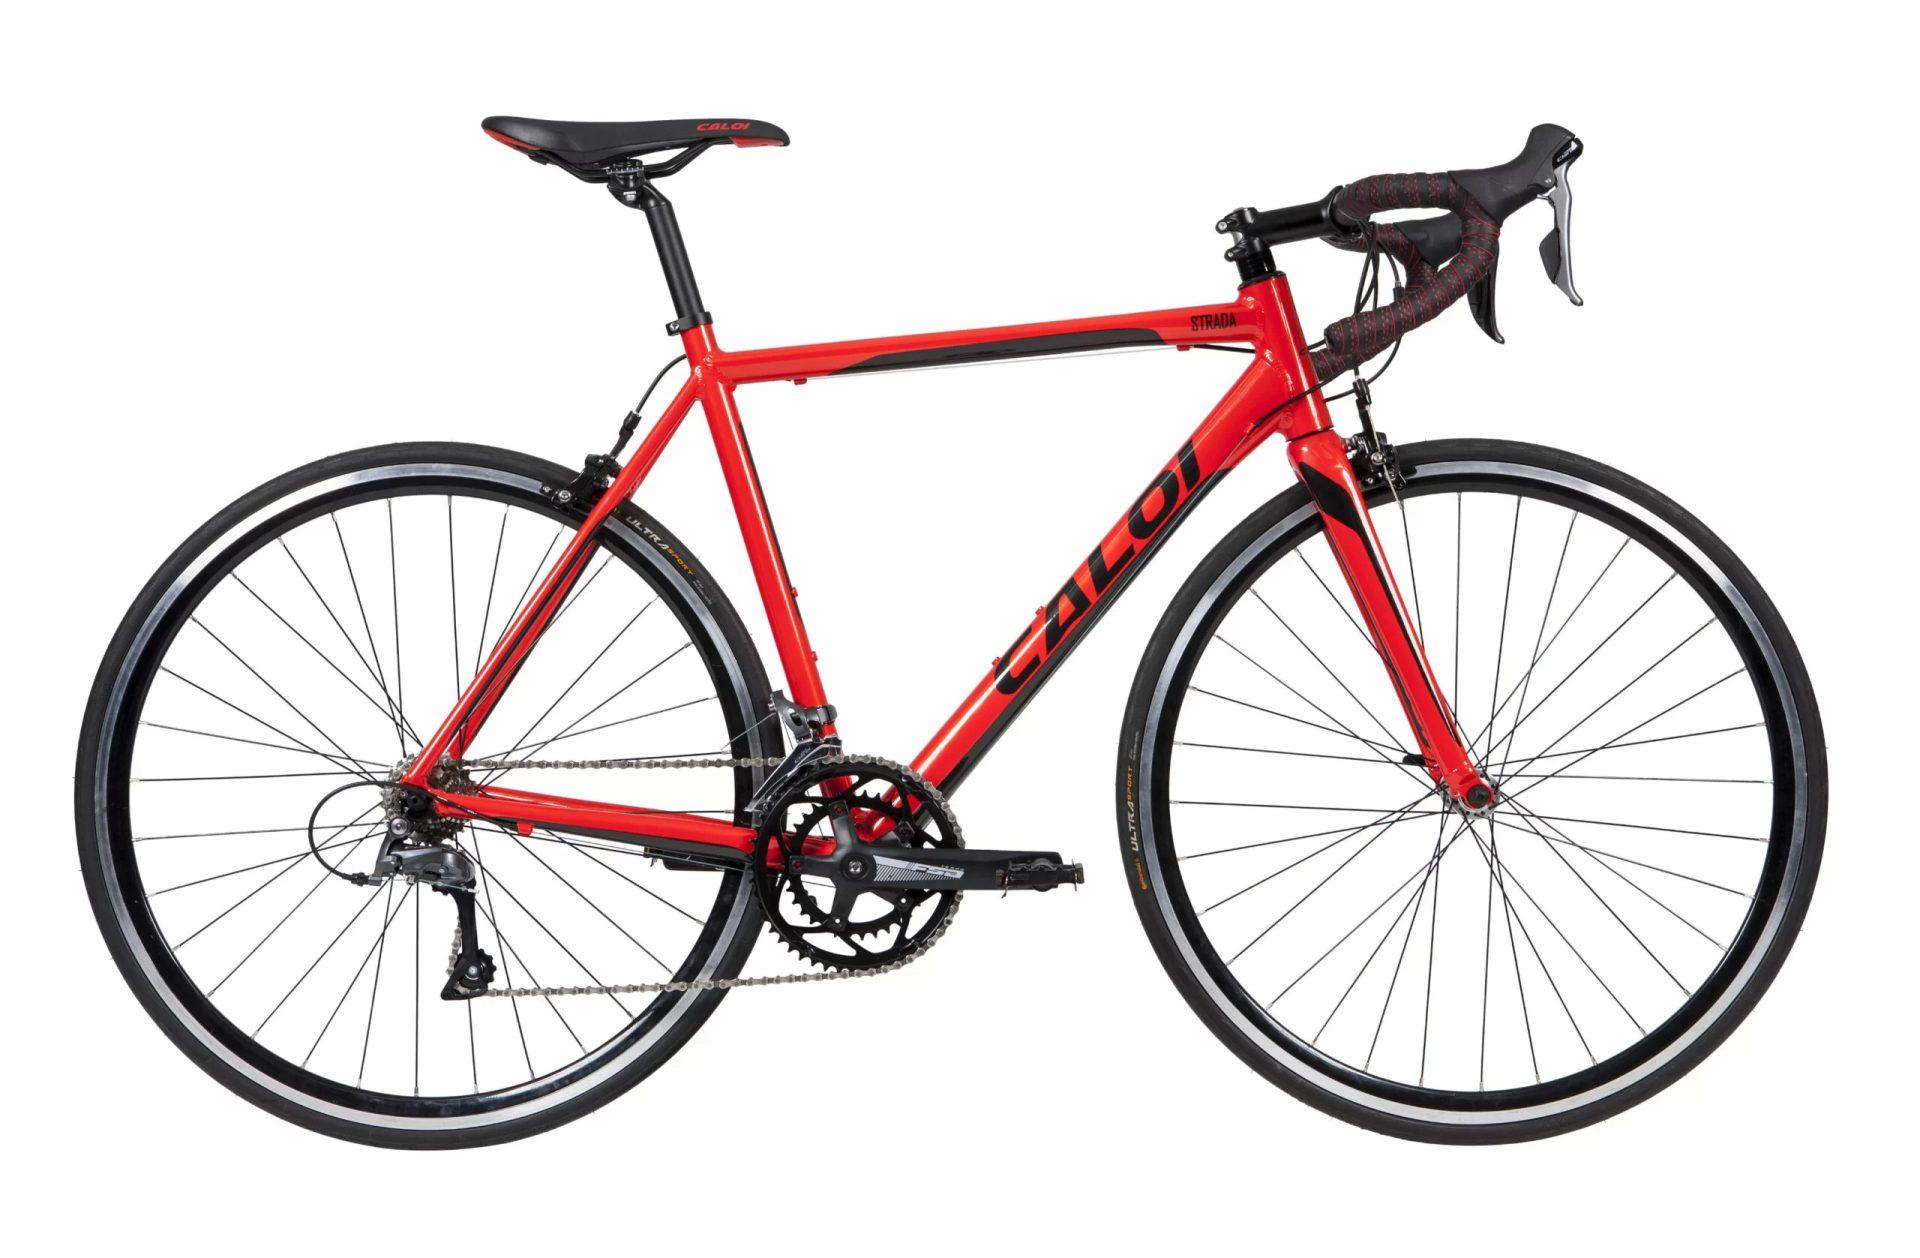 Bicicleta speed barata, Caloi Strada 2021